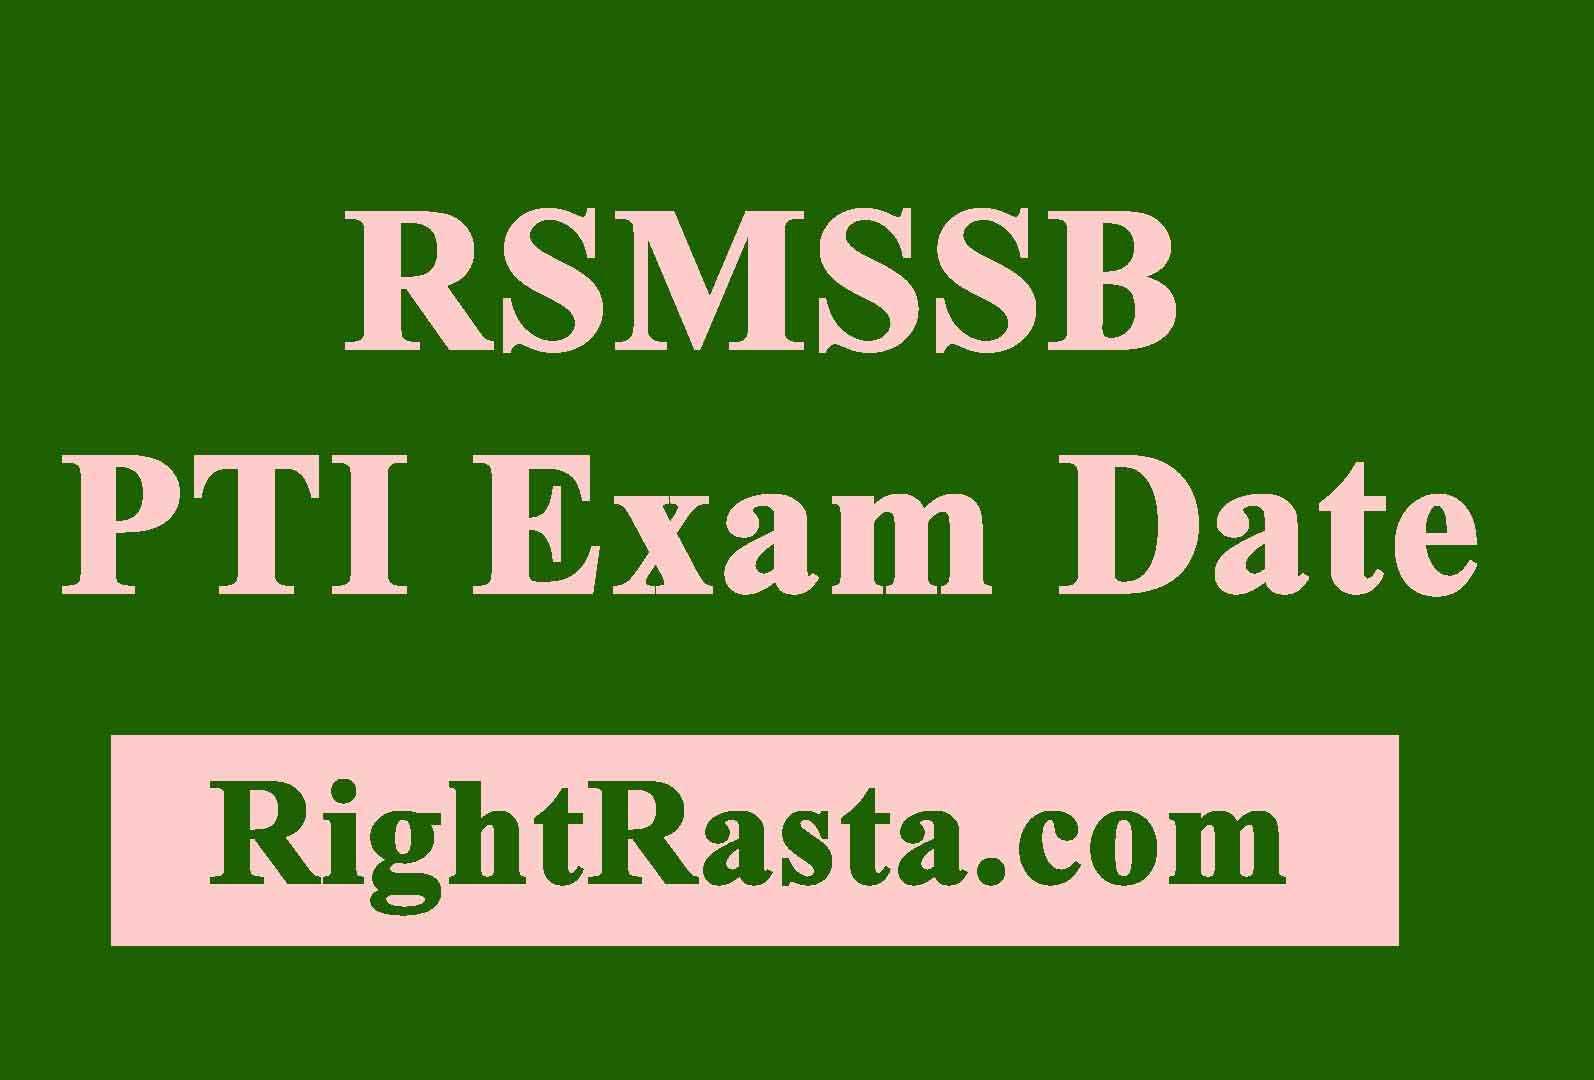 RSMSSB PTI Exam Date